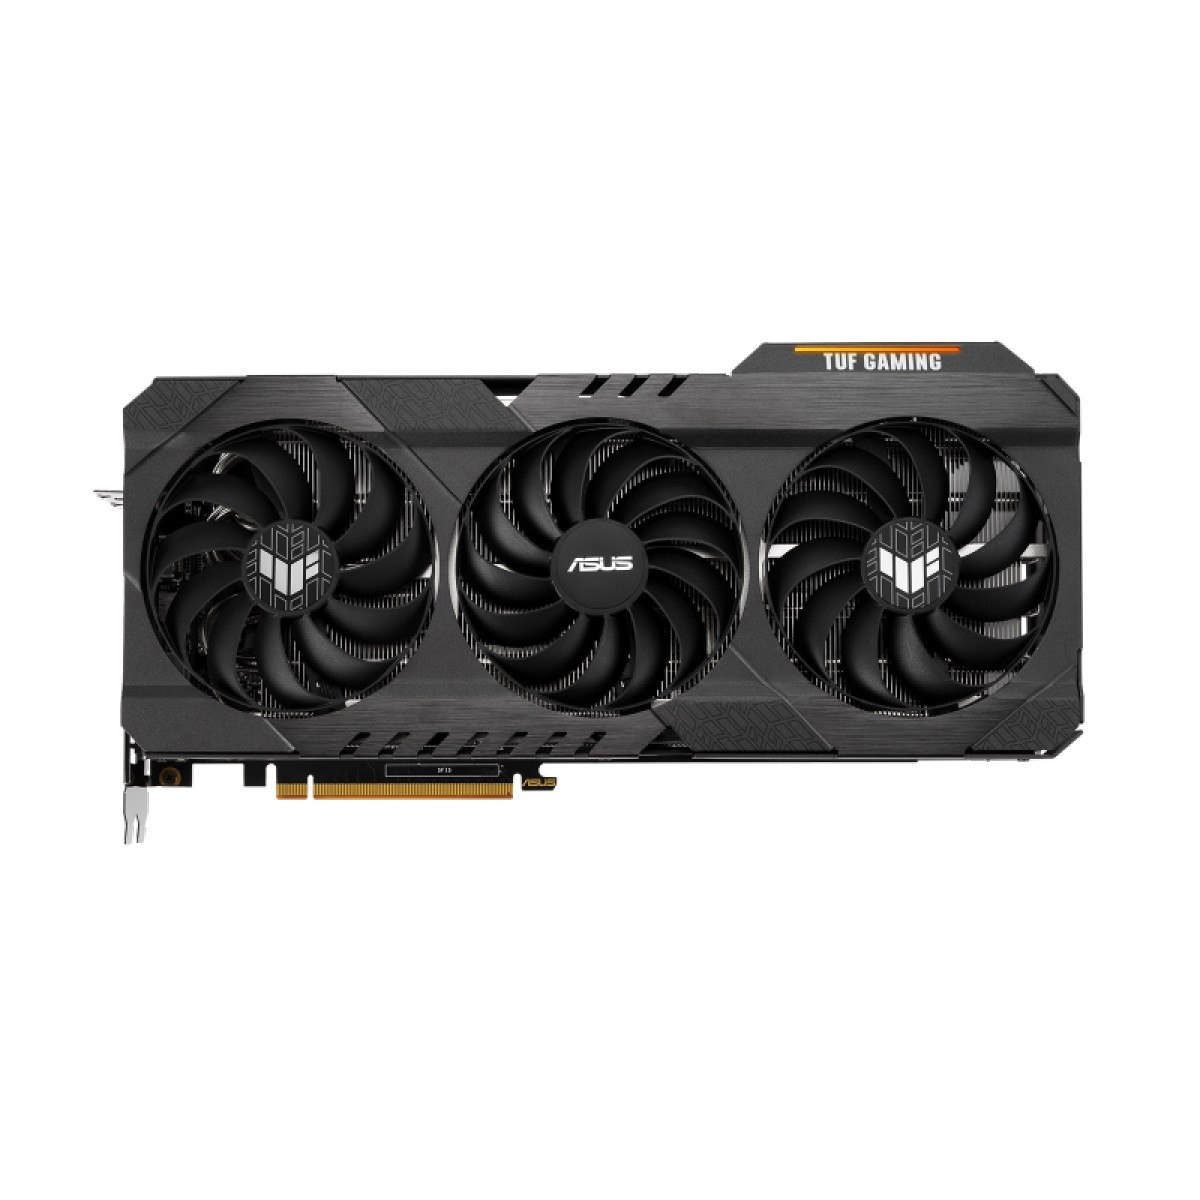 Kit Upgrade Asus TUF Gaming Radeon RX 6800 XT OC + AMD Ryzen 9 5900X + Brinde Jogo Dirt 5